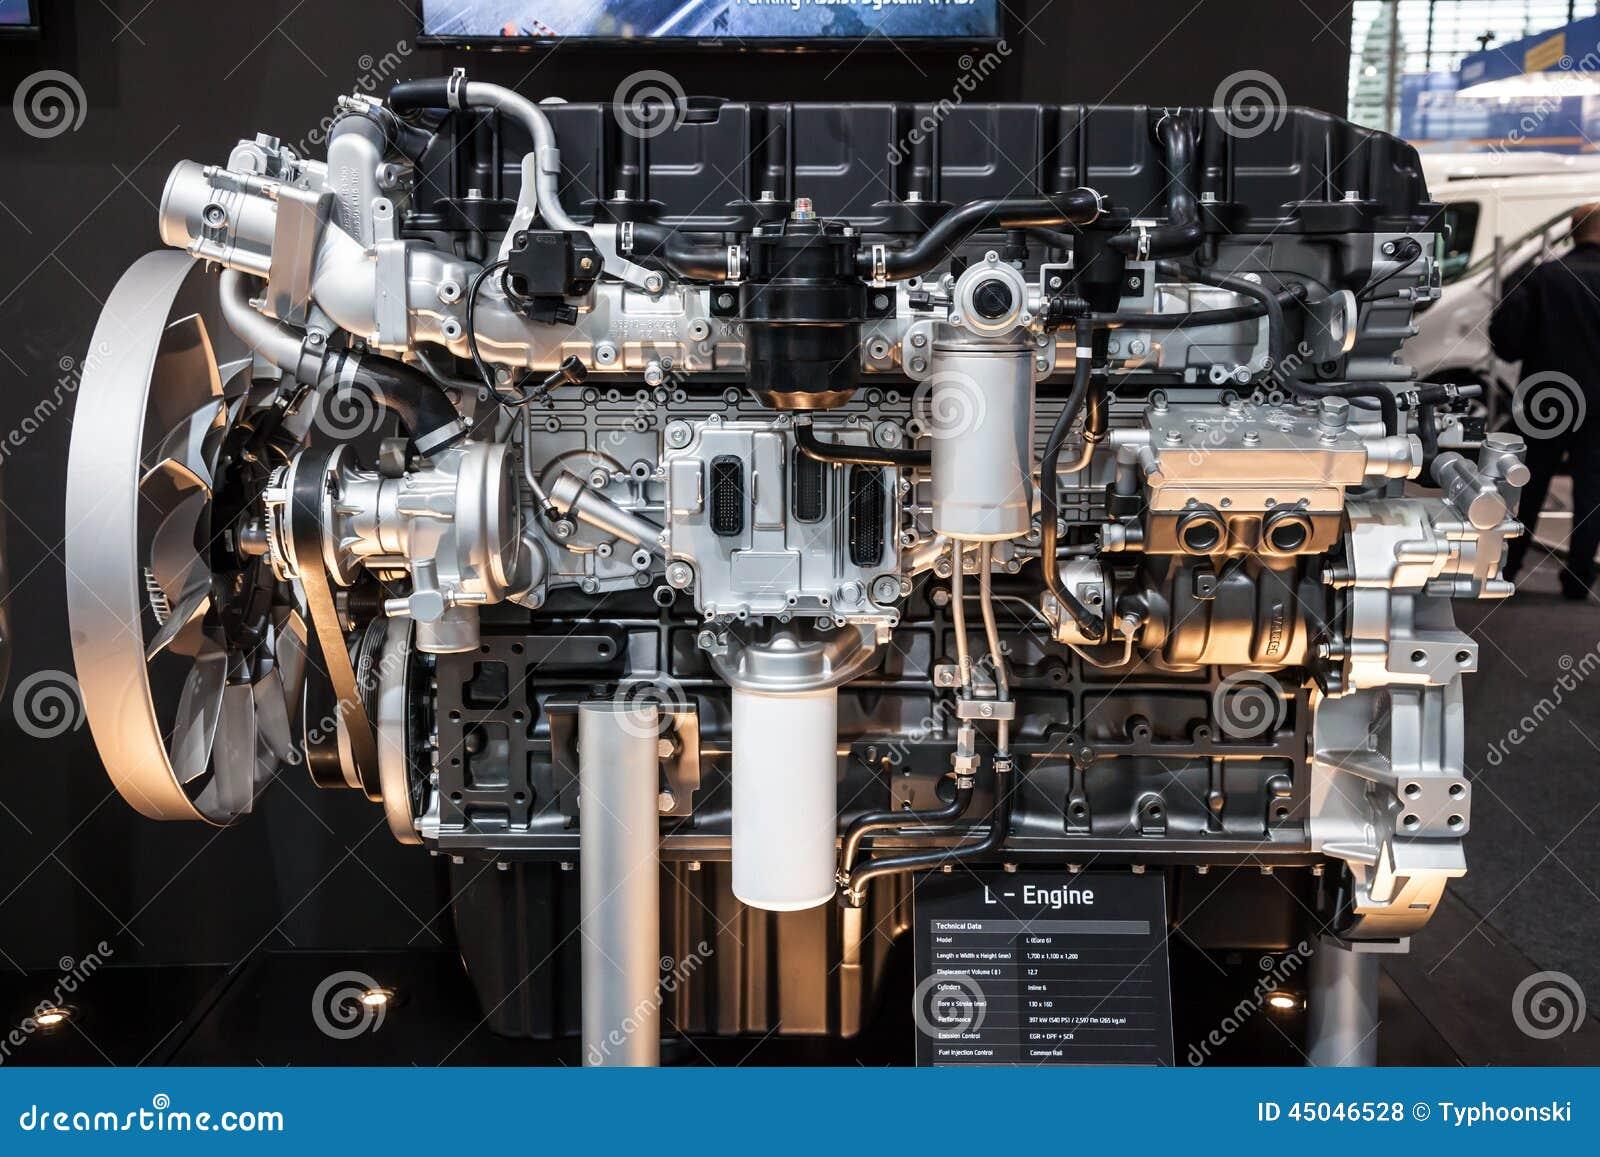 Hyundai 1 6 Crdi File Hyundai I30cw 1 6 Crdi Edition20 I